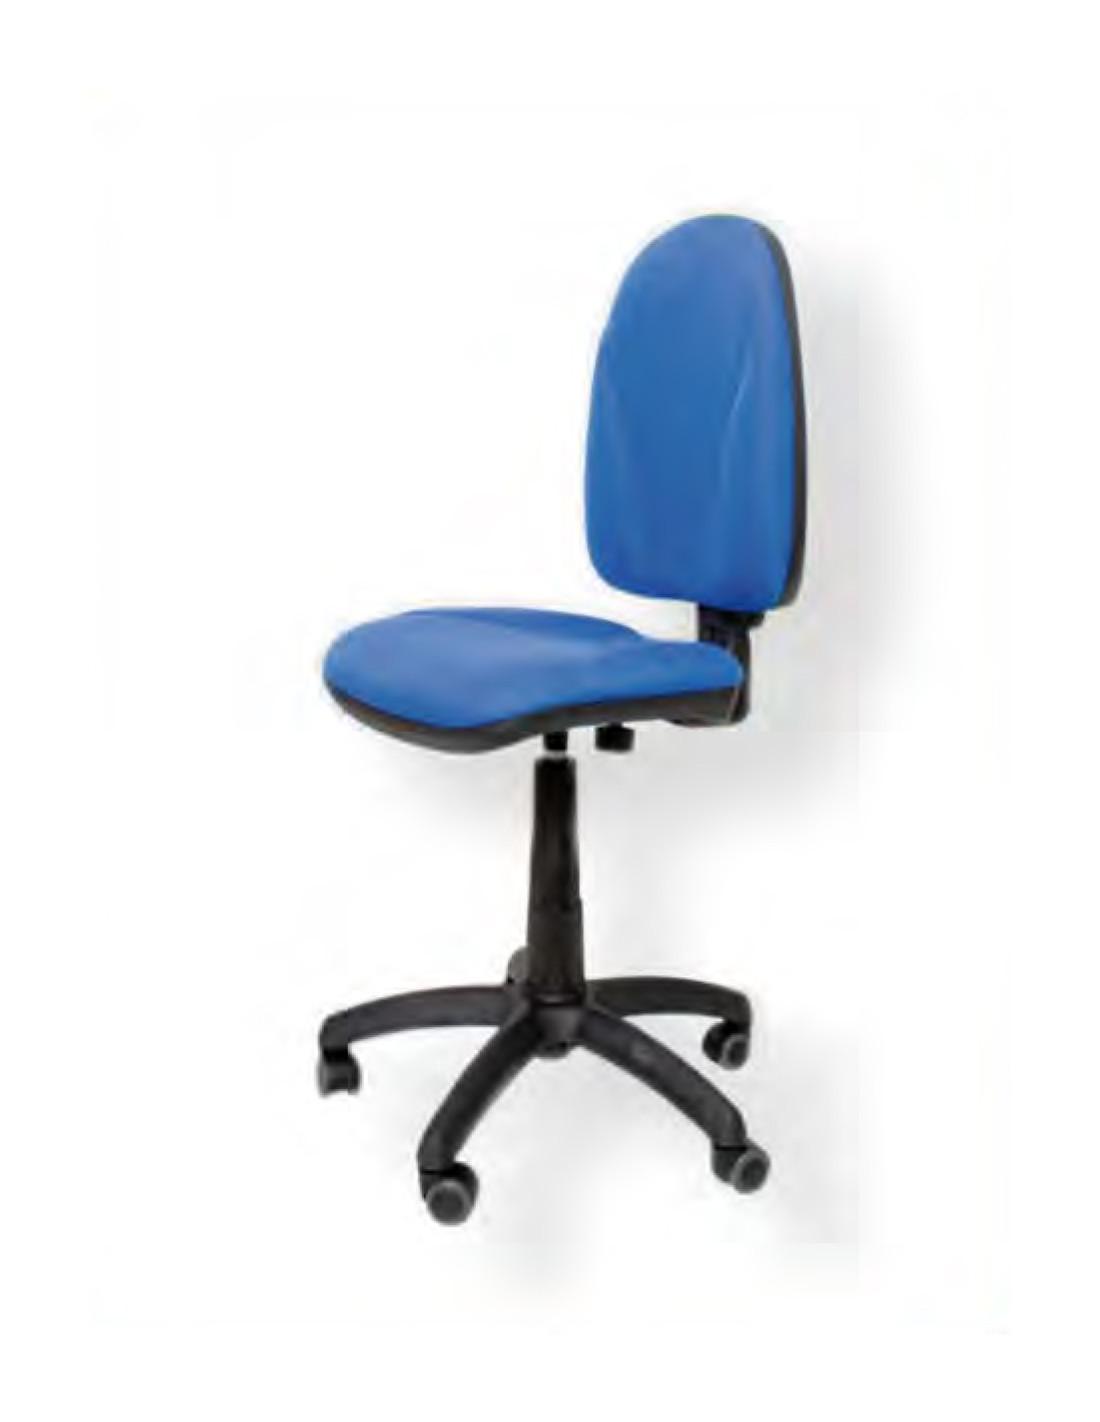 silla oficina tapizado azul sin ruedas tienda asg